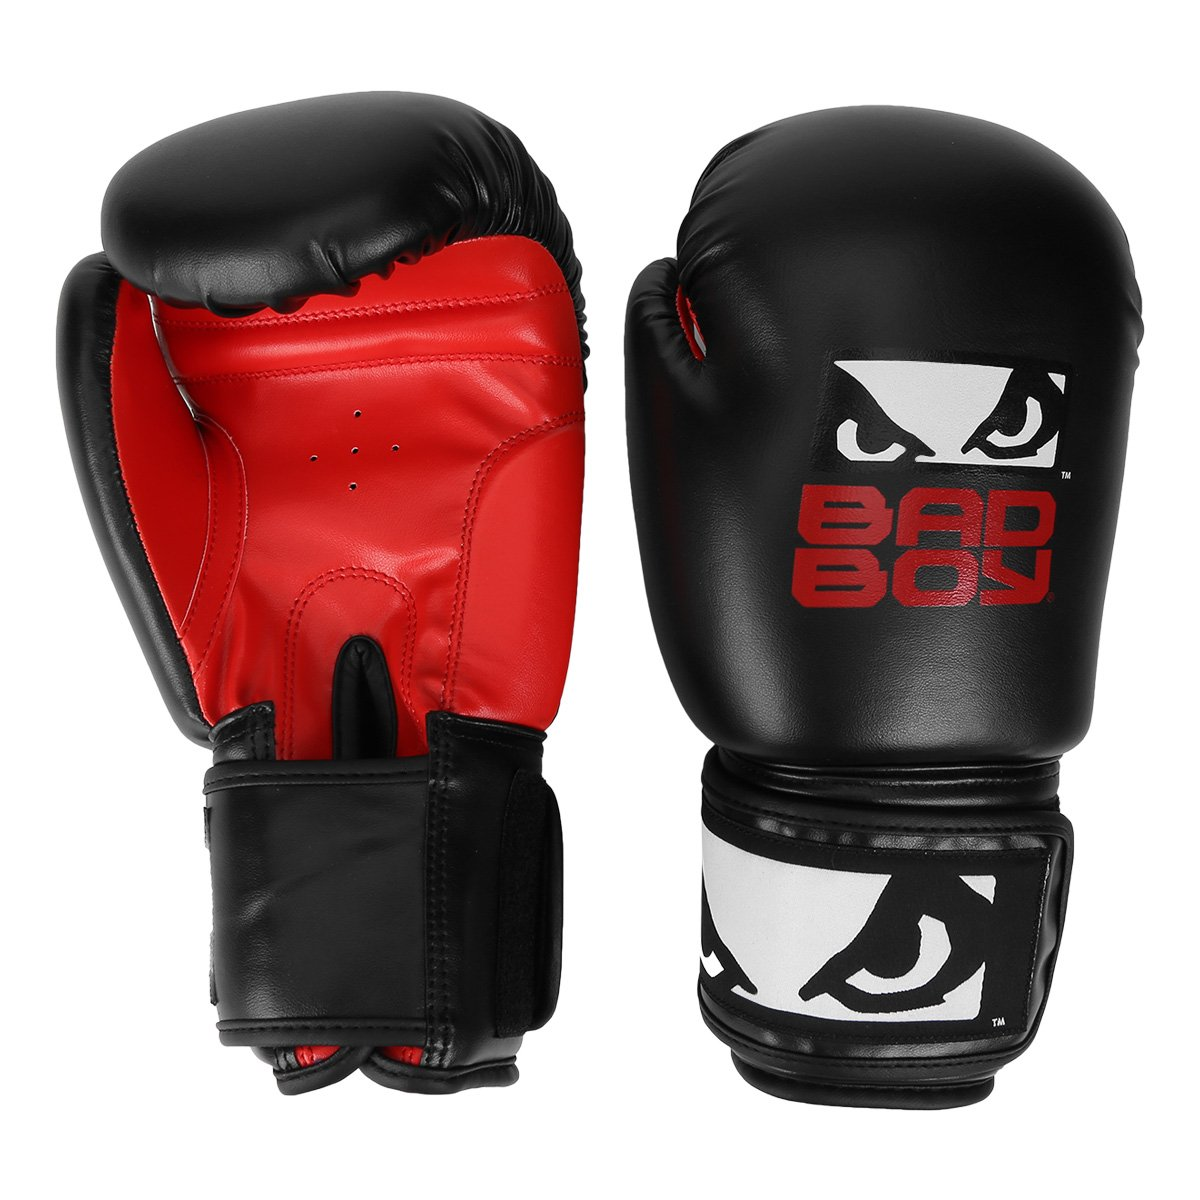 7fb220ec2 FornecedorNetshoes. Luva de Boxe Muay Thai Treino Bad Boy 12 OZ